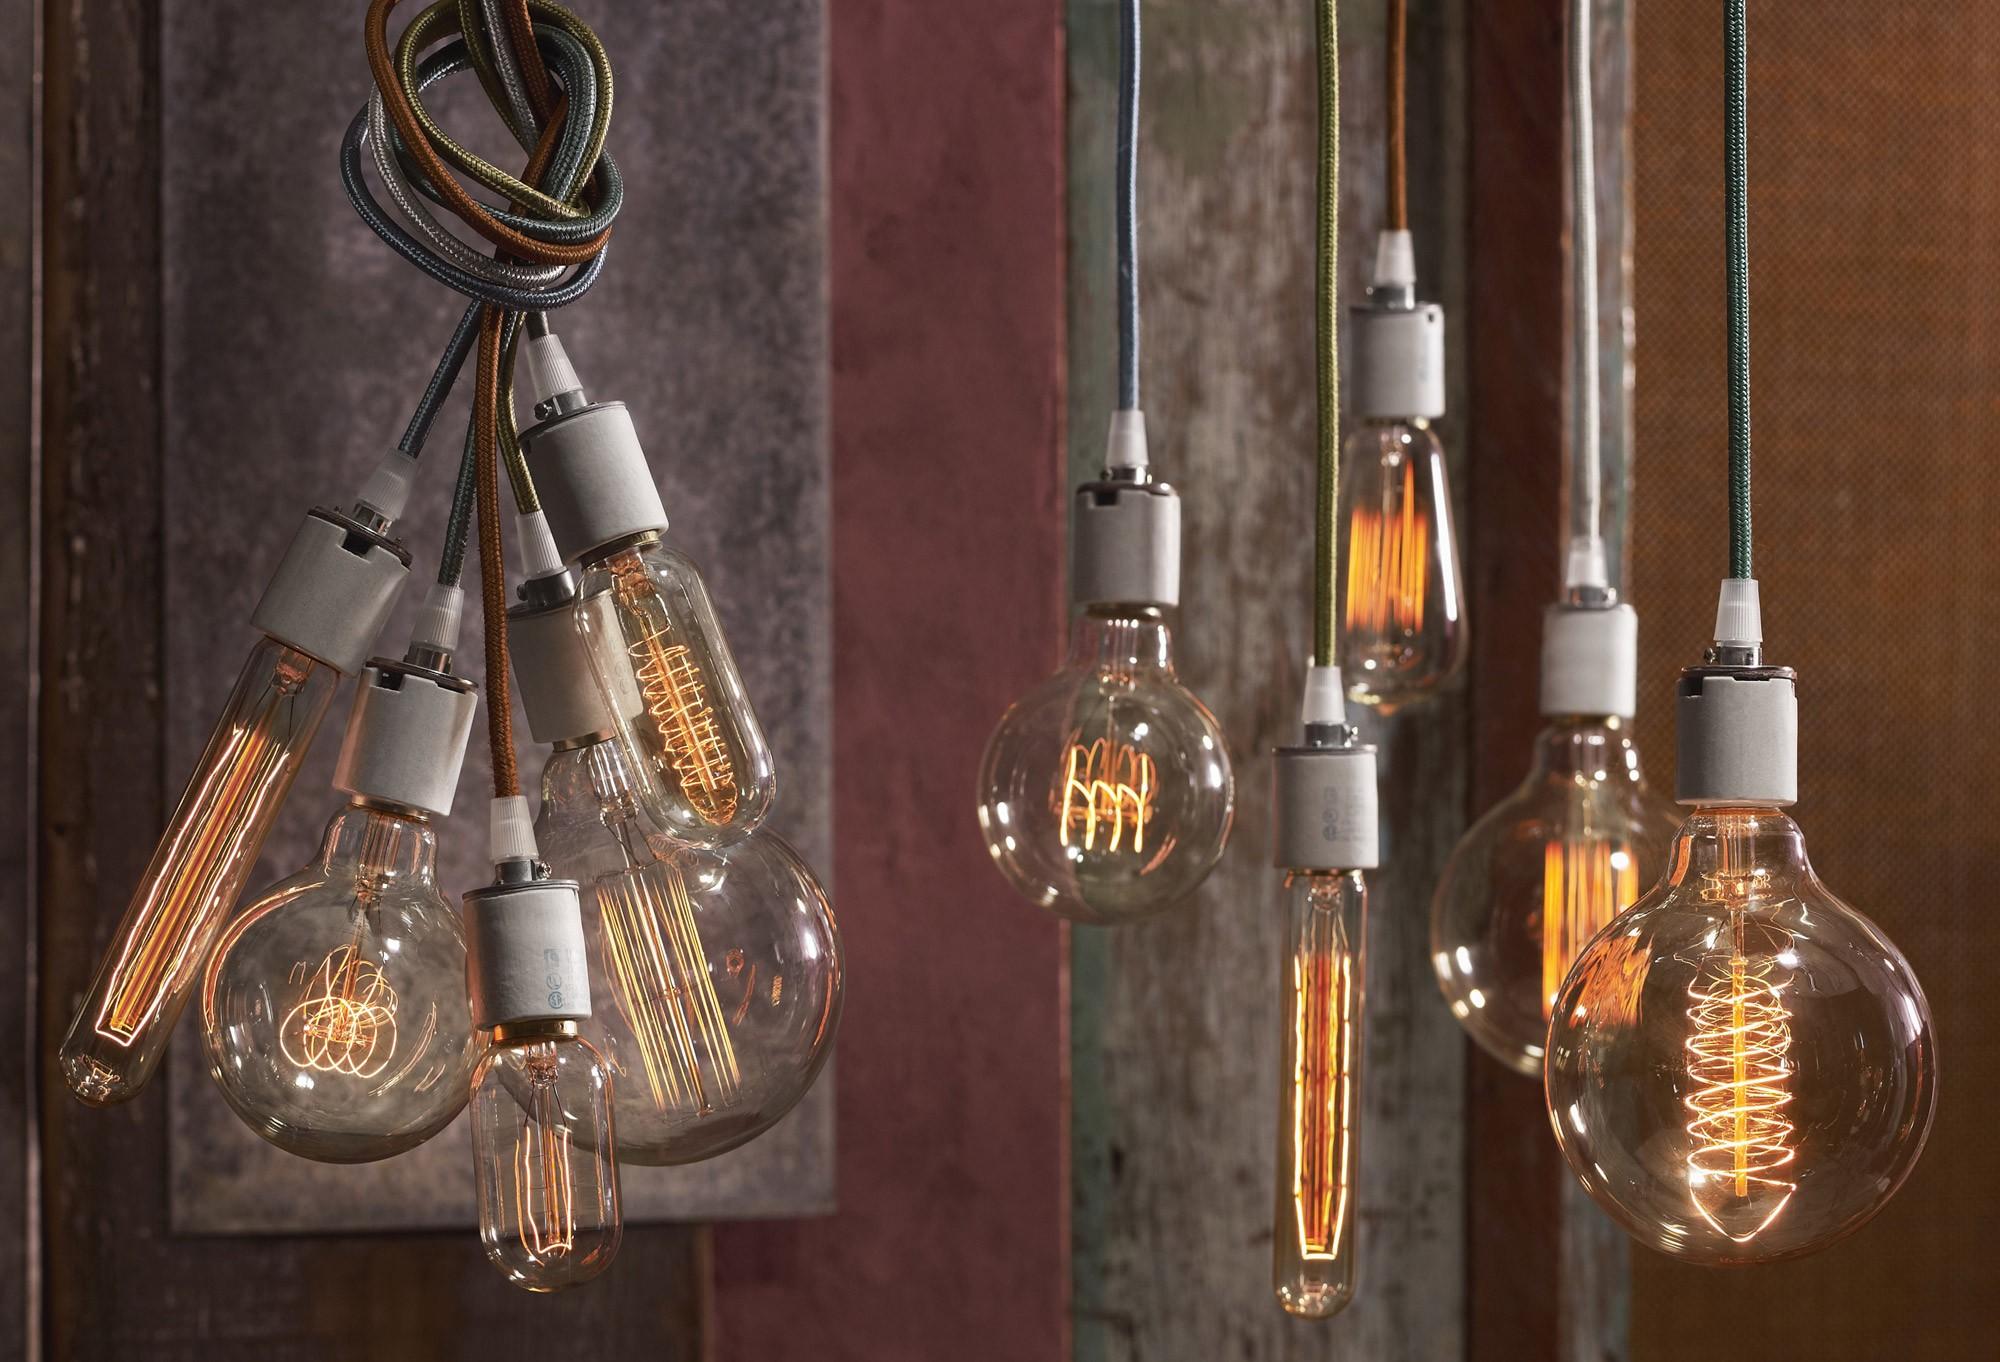 Bulbrite Nostalgic Bulbs